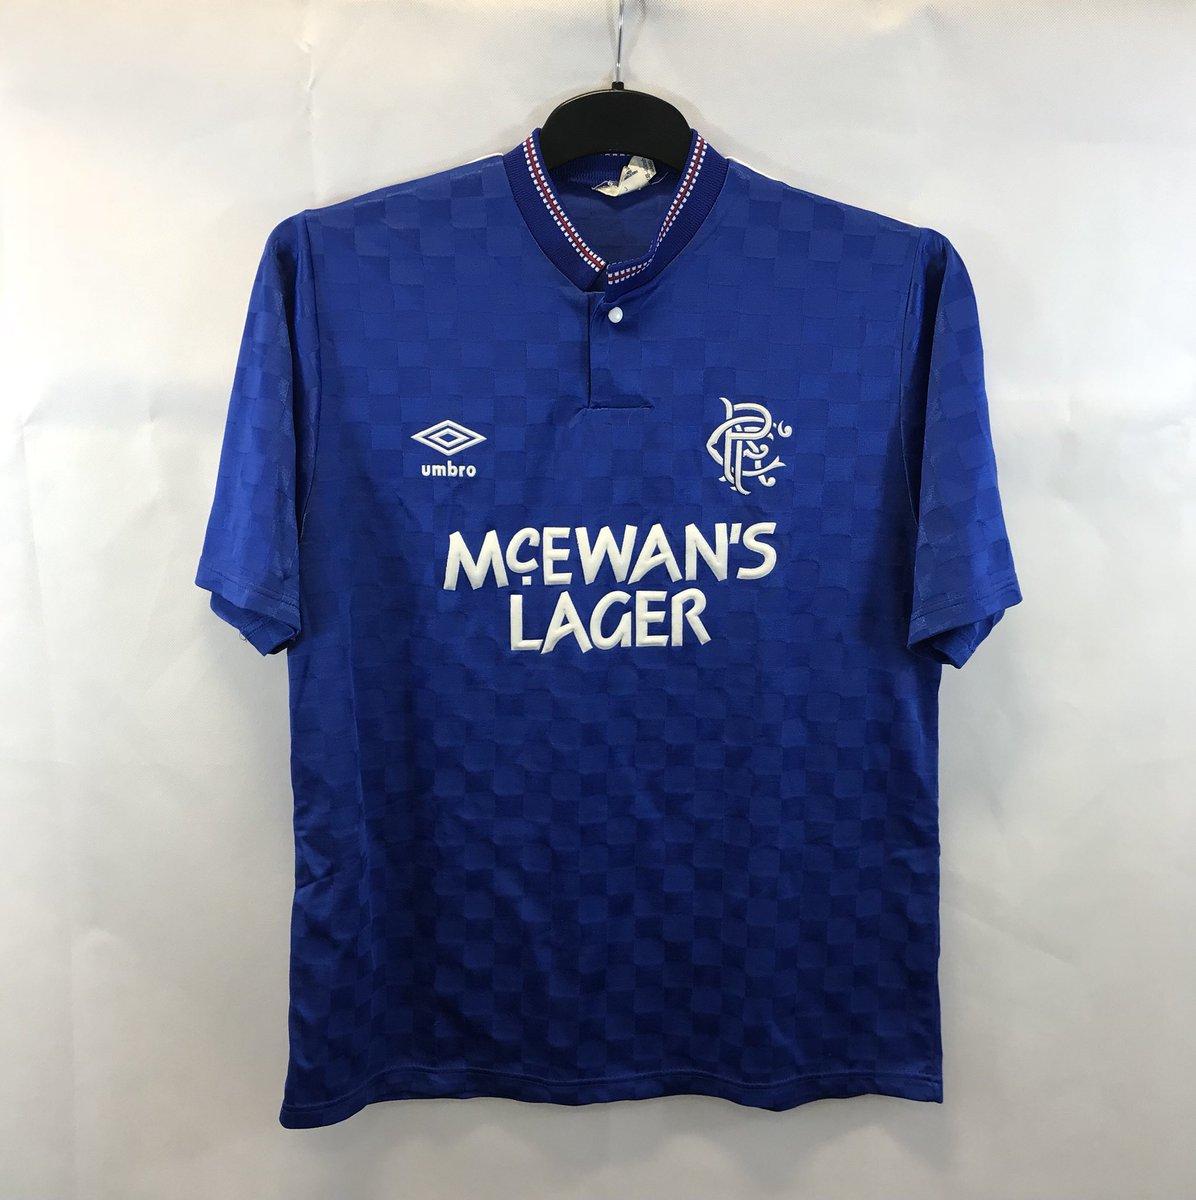 915dc5e45 Rangers Home Football Shirt 1987 90 Adults Medium Umbro  http   historicfootballshirts.co.uk shop rangers-football-shirt -1987-88-adults-medium-umbro  …